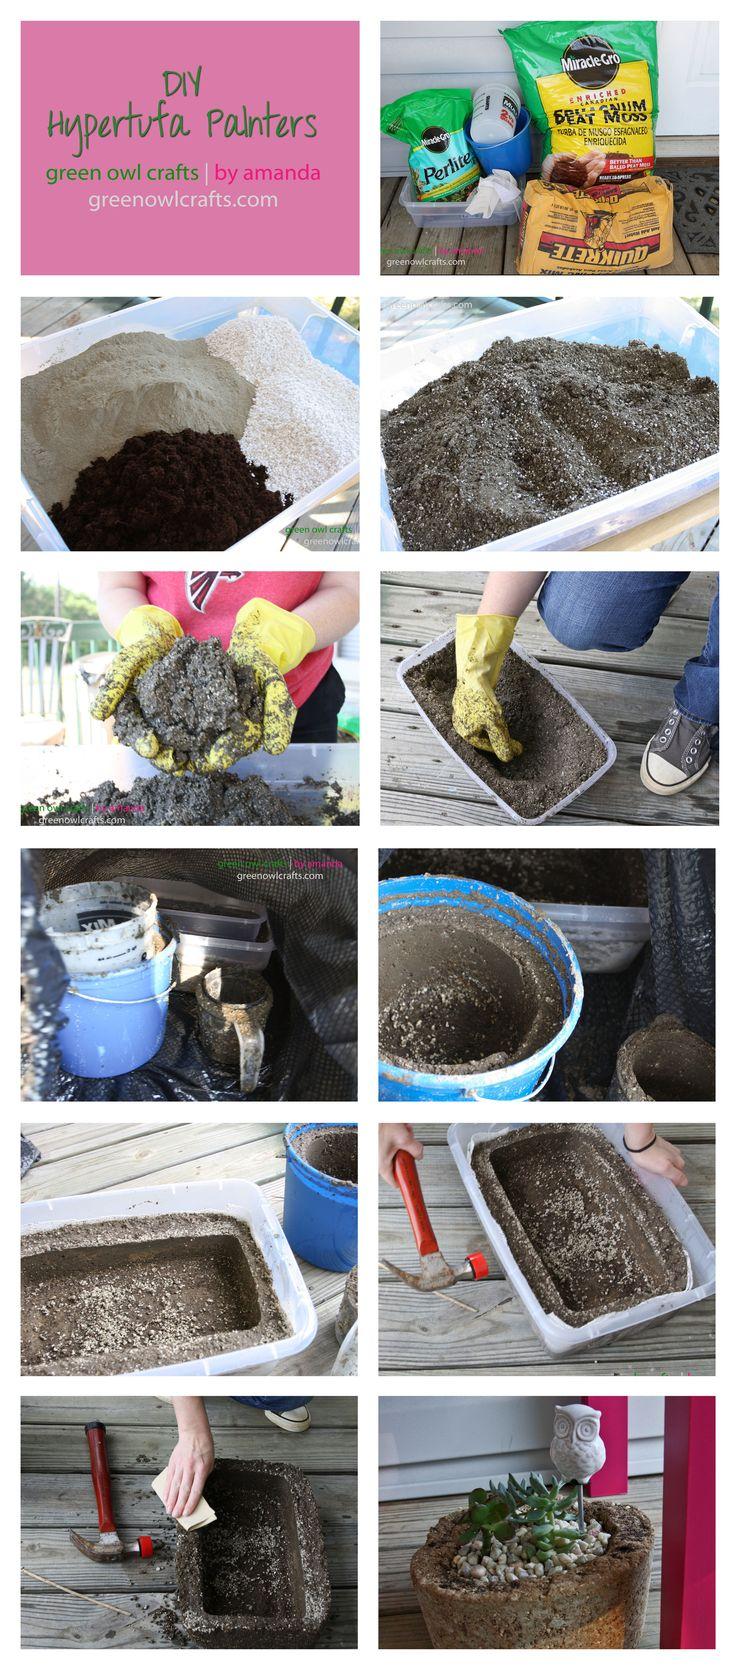 DIY Hypertufa Planters--this is a good beginner tutorial by a beginner.